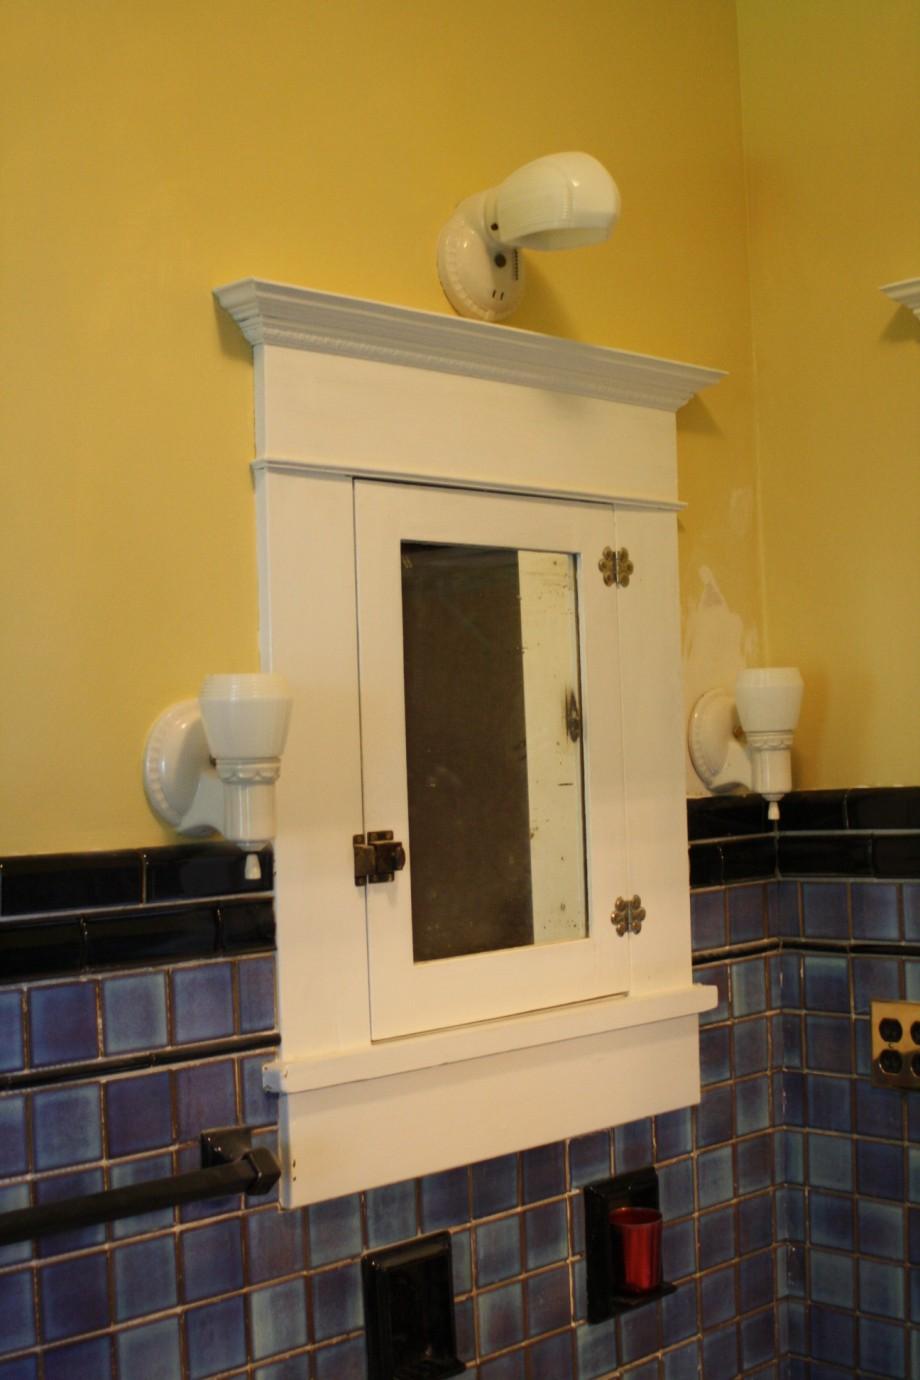 Arts and crafts bathroom tile - American Universal Blue Black Tile Bathroom Mirror